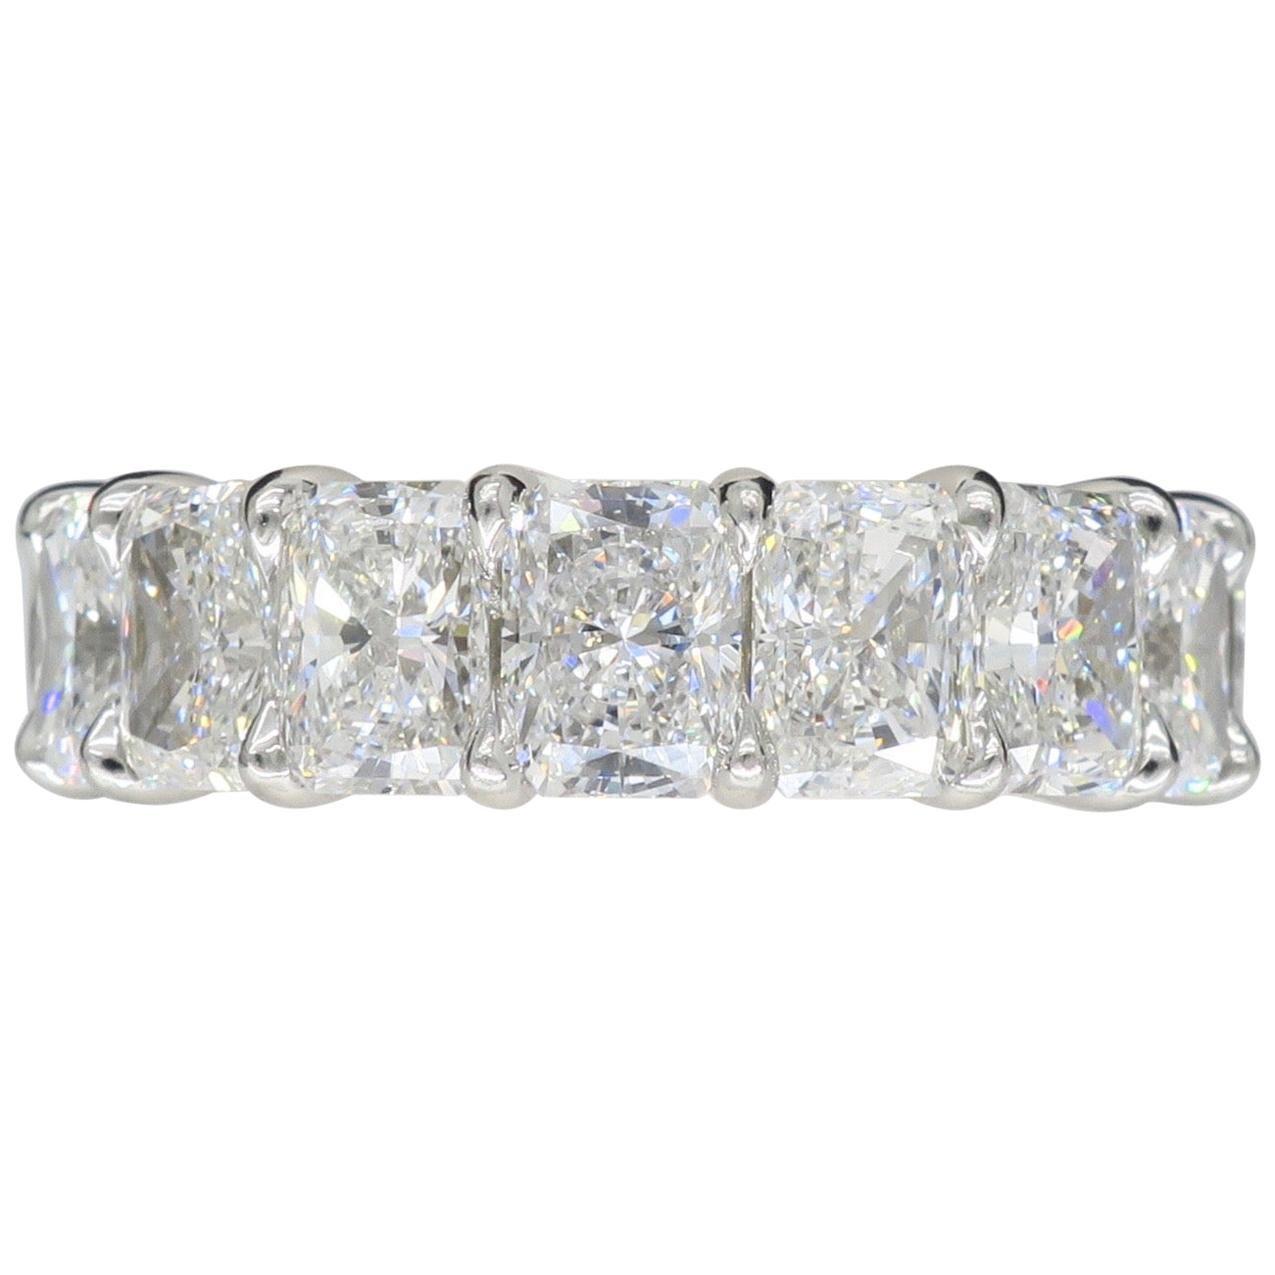 Harry Winston 9.35 Carat Radiant Diamond Platinum Eternity Rock Band Ring